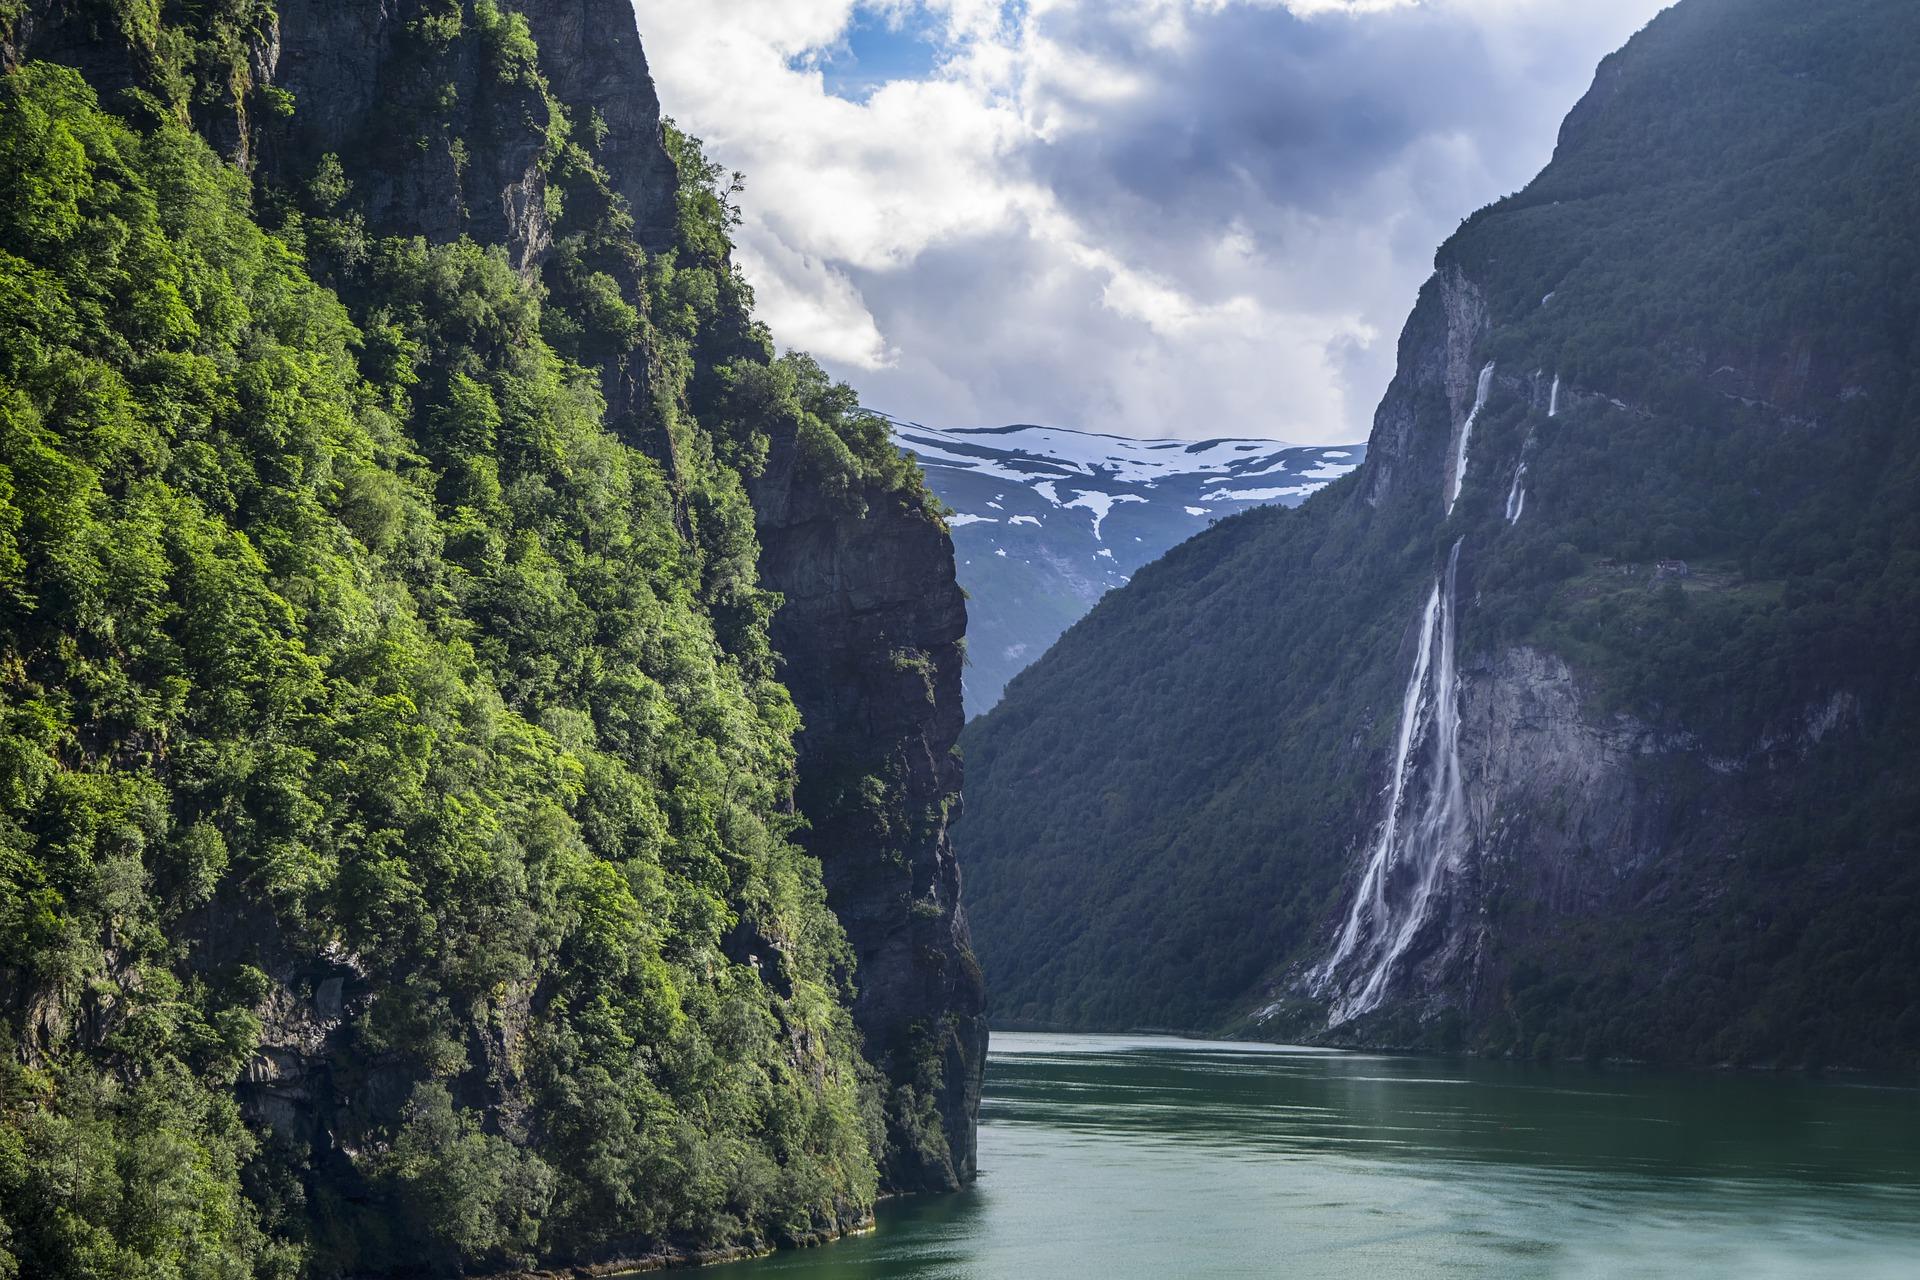 waterfall-5838582_1920.jpg